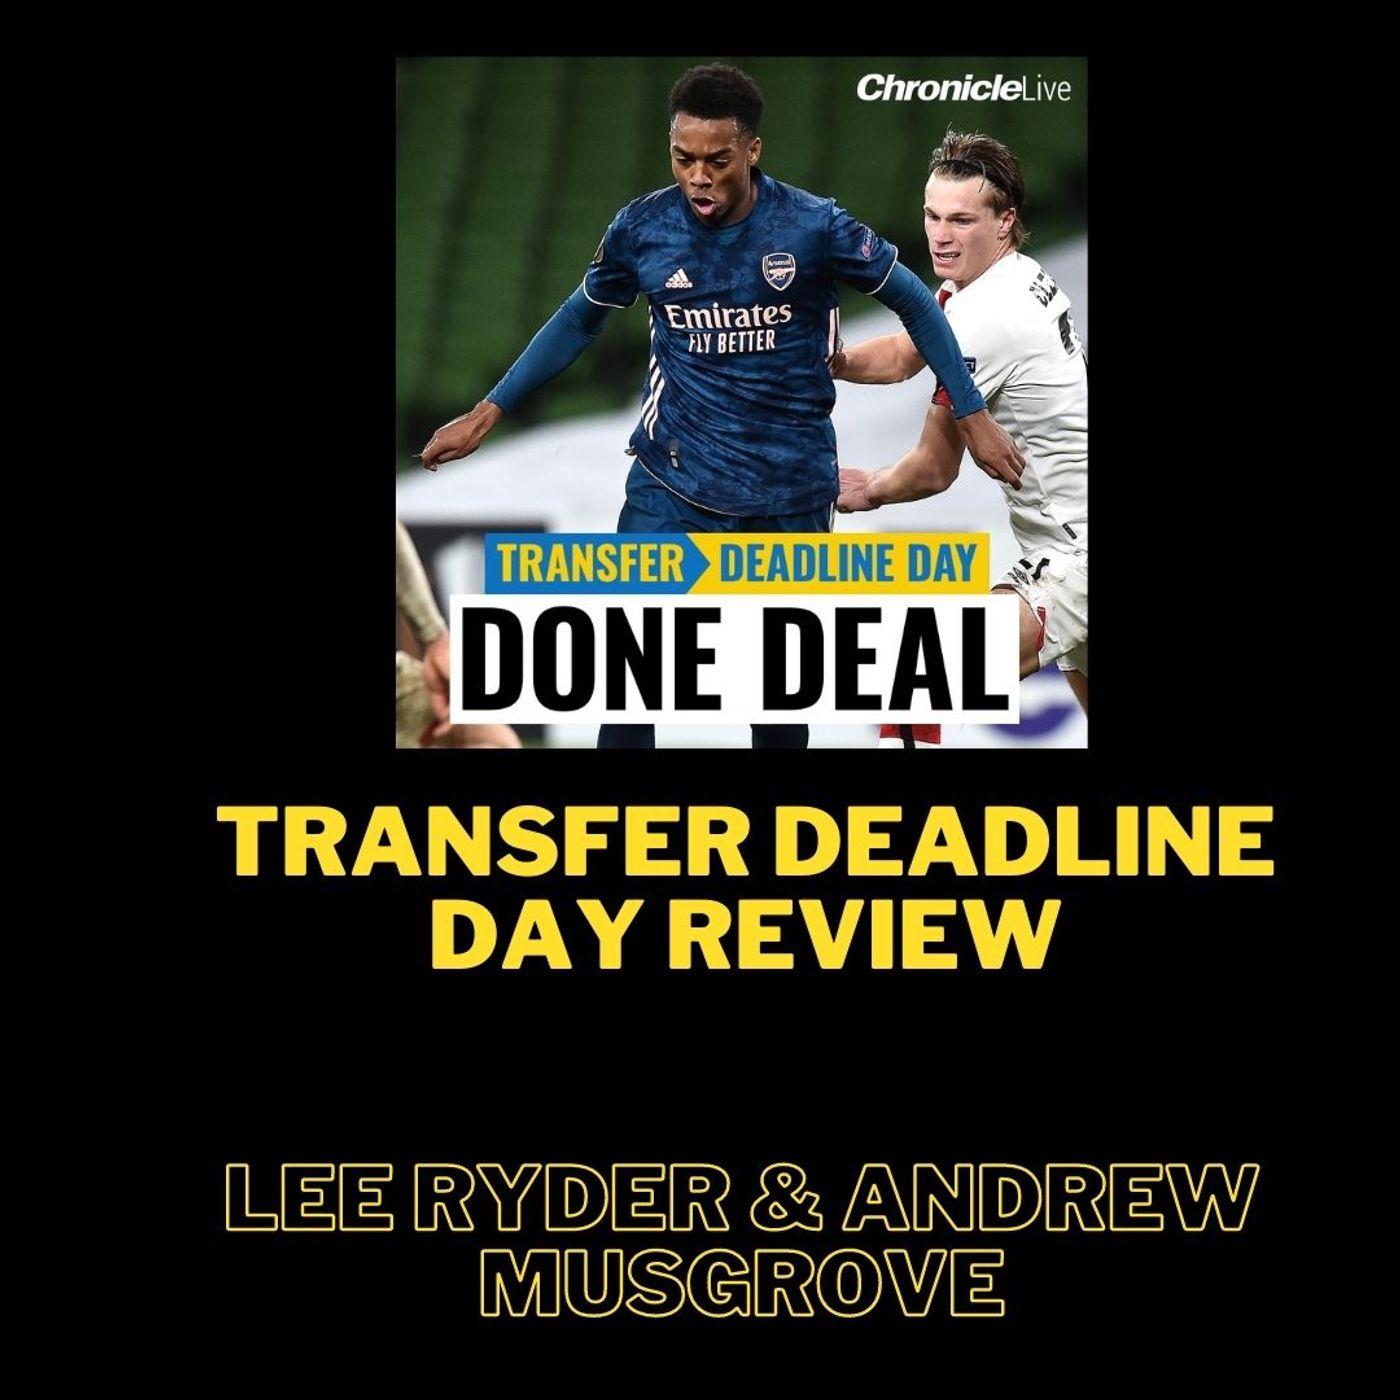 'It's a baffling one in someways' - Lee Ryder analyses transfer deadline day as Joe Willock signs